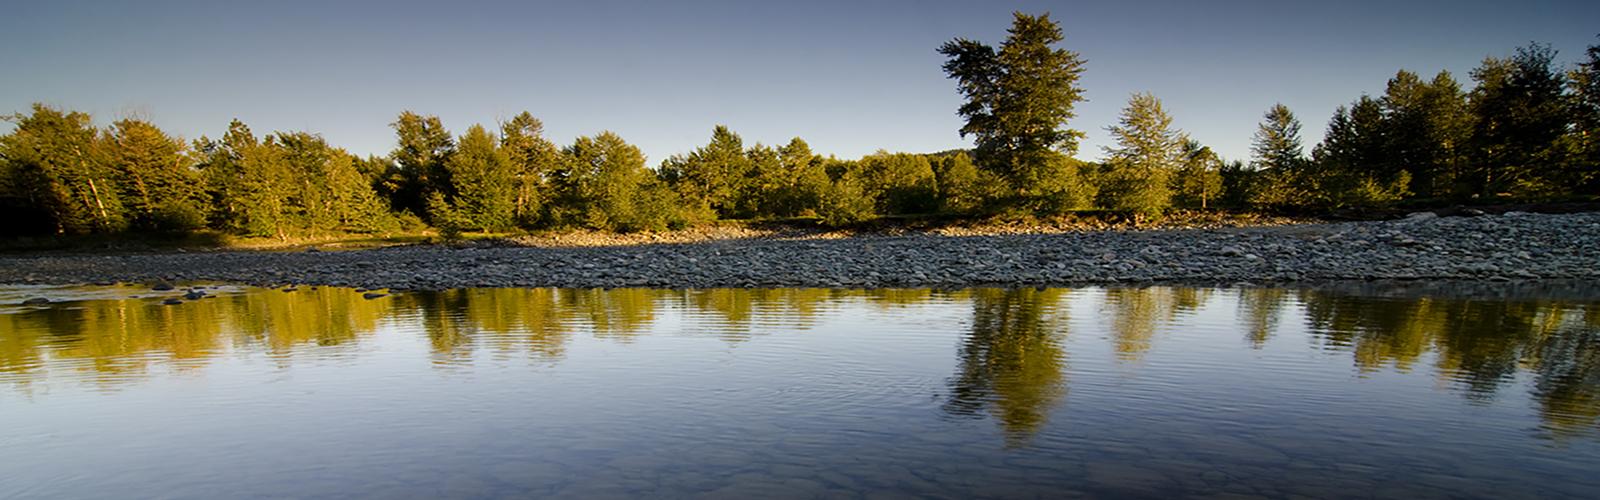 Tulameen River 26, Princeton, Similkameen, summer, landscape, Darren Robinson